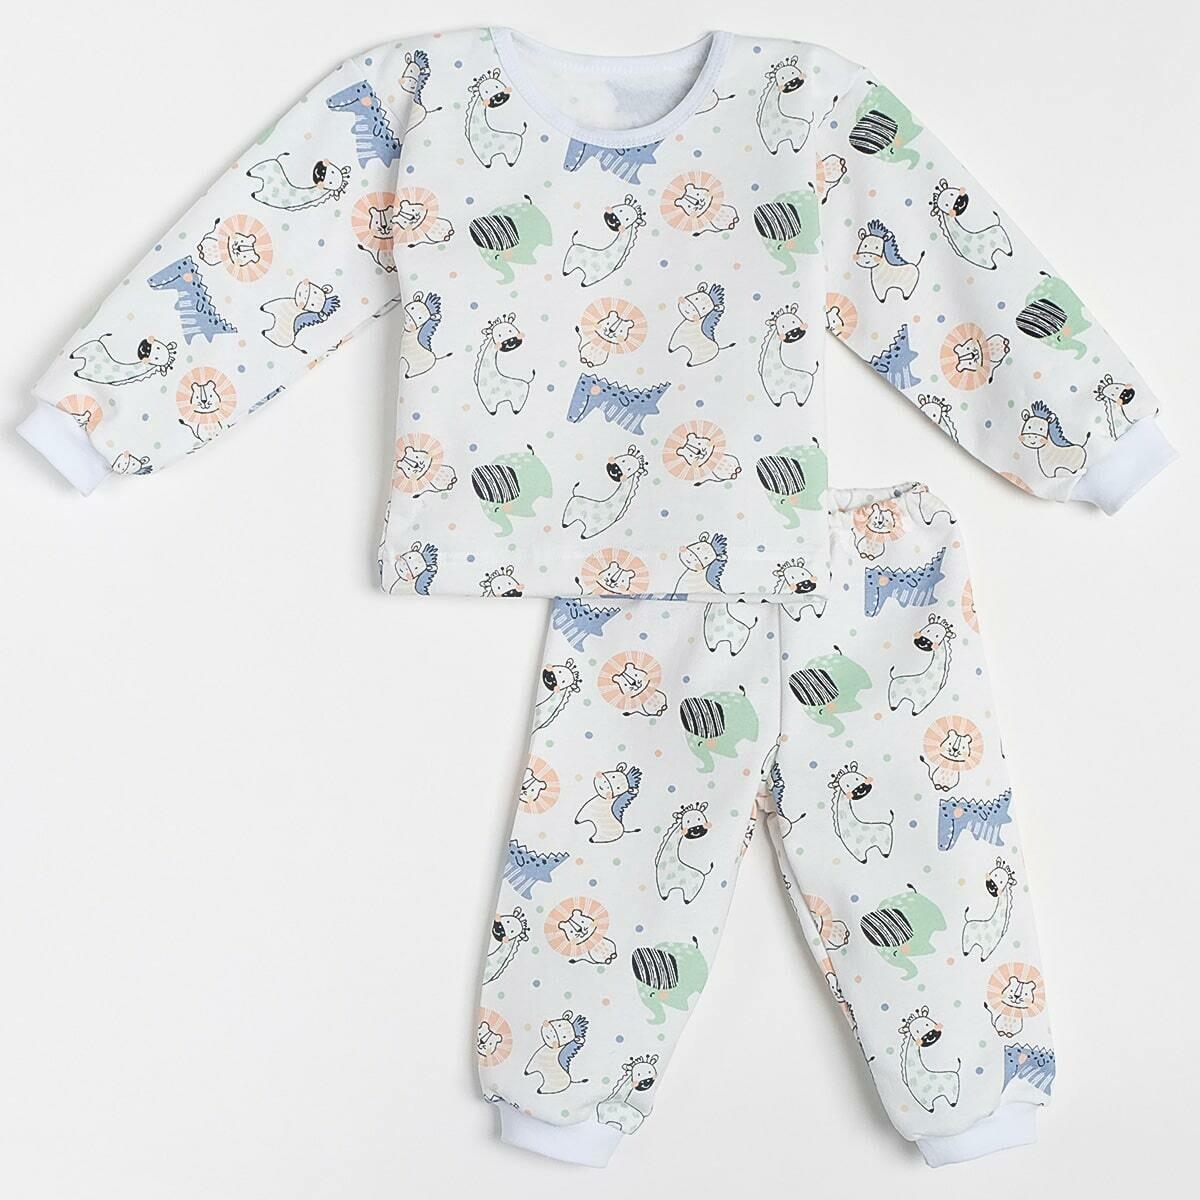 Пижама БЕГЕМОТИК на манжетах, тёплая с начёсом, животные